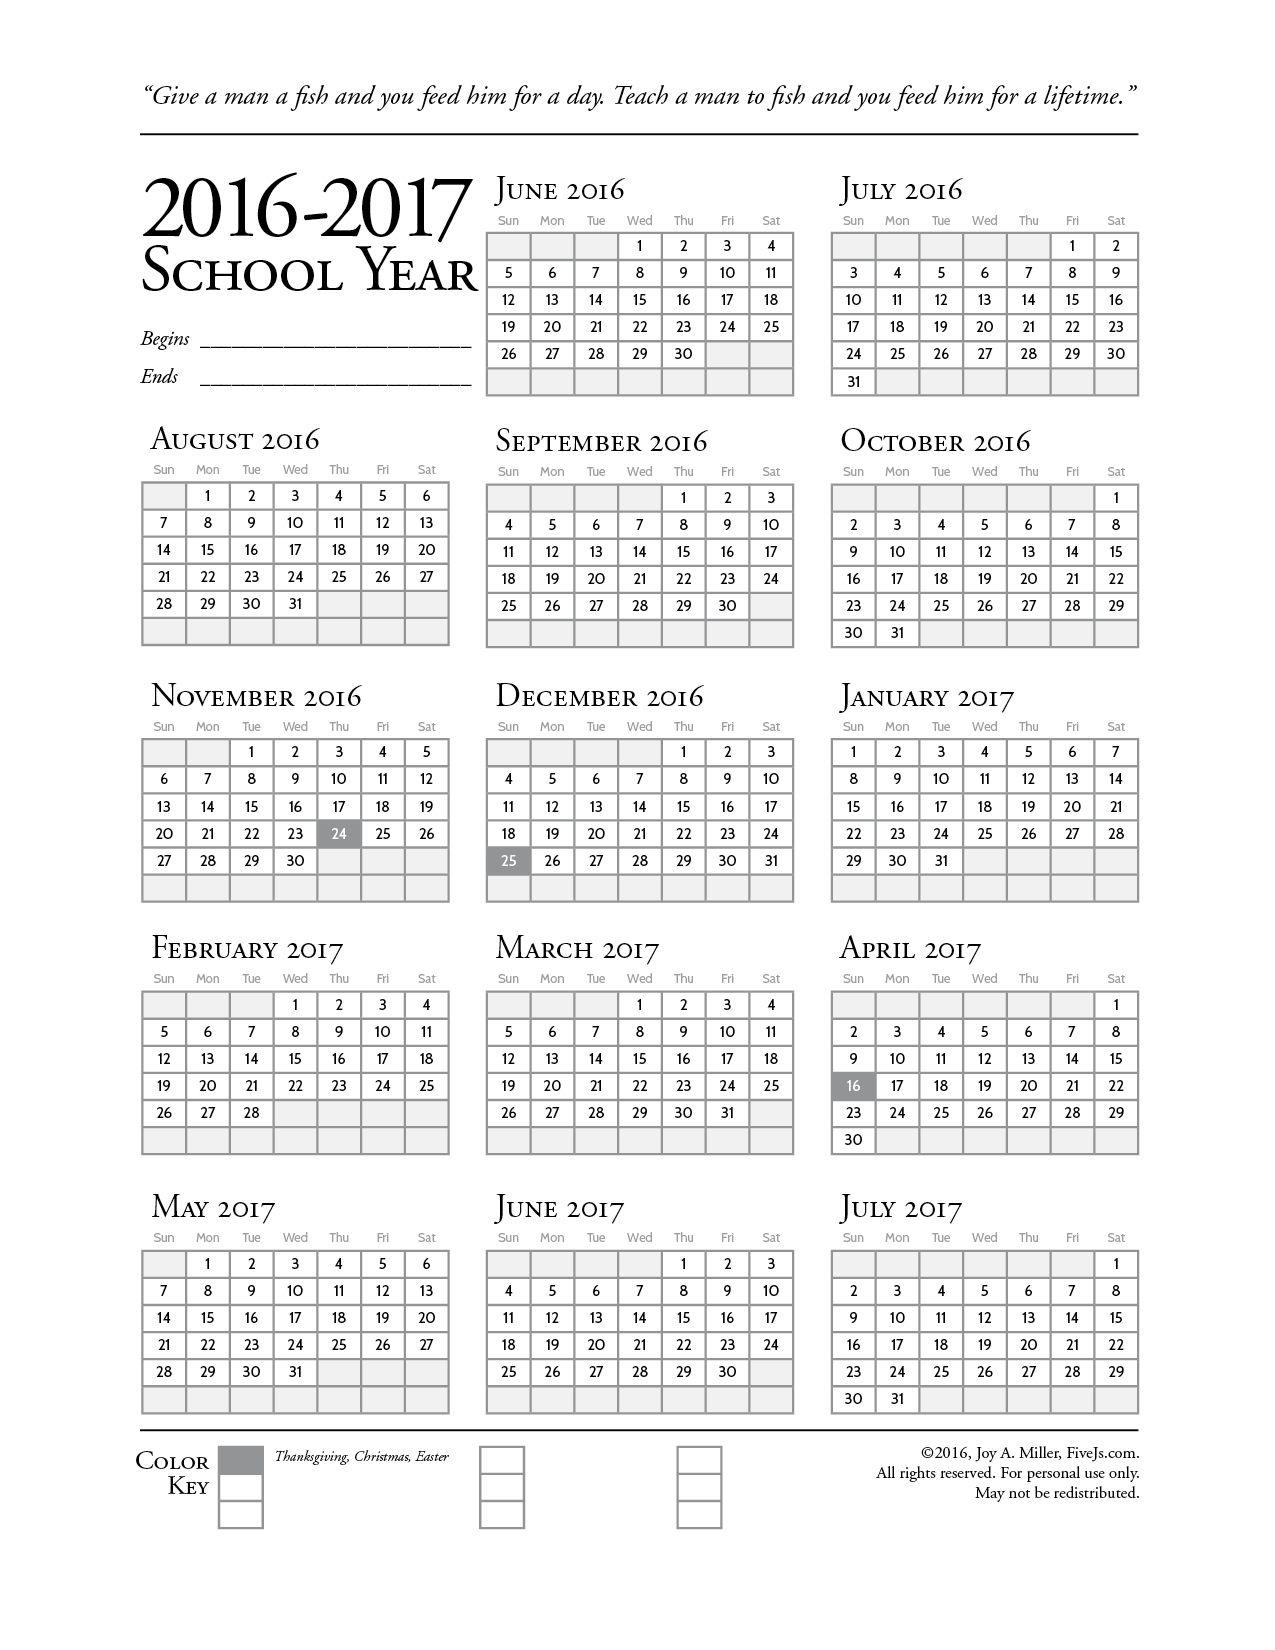 Homeschool Printables Downloads Five J S Homeschool Homeschool Calendar School Calendar Homeschool Printables [ 1650 x 1275 Pixel ]